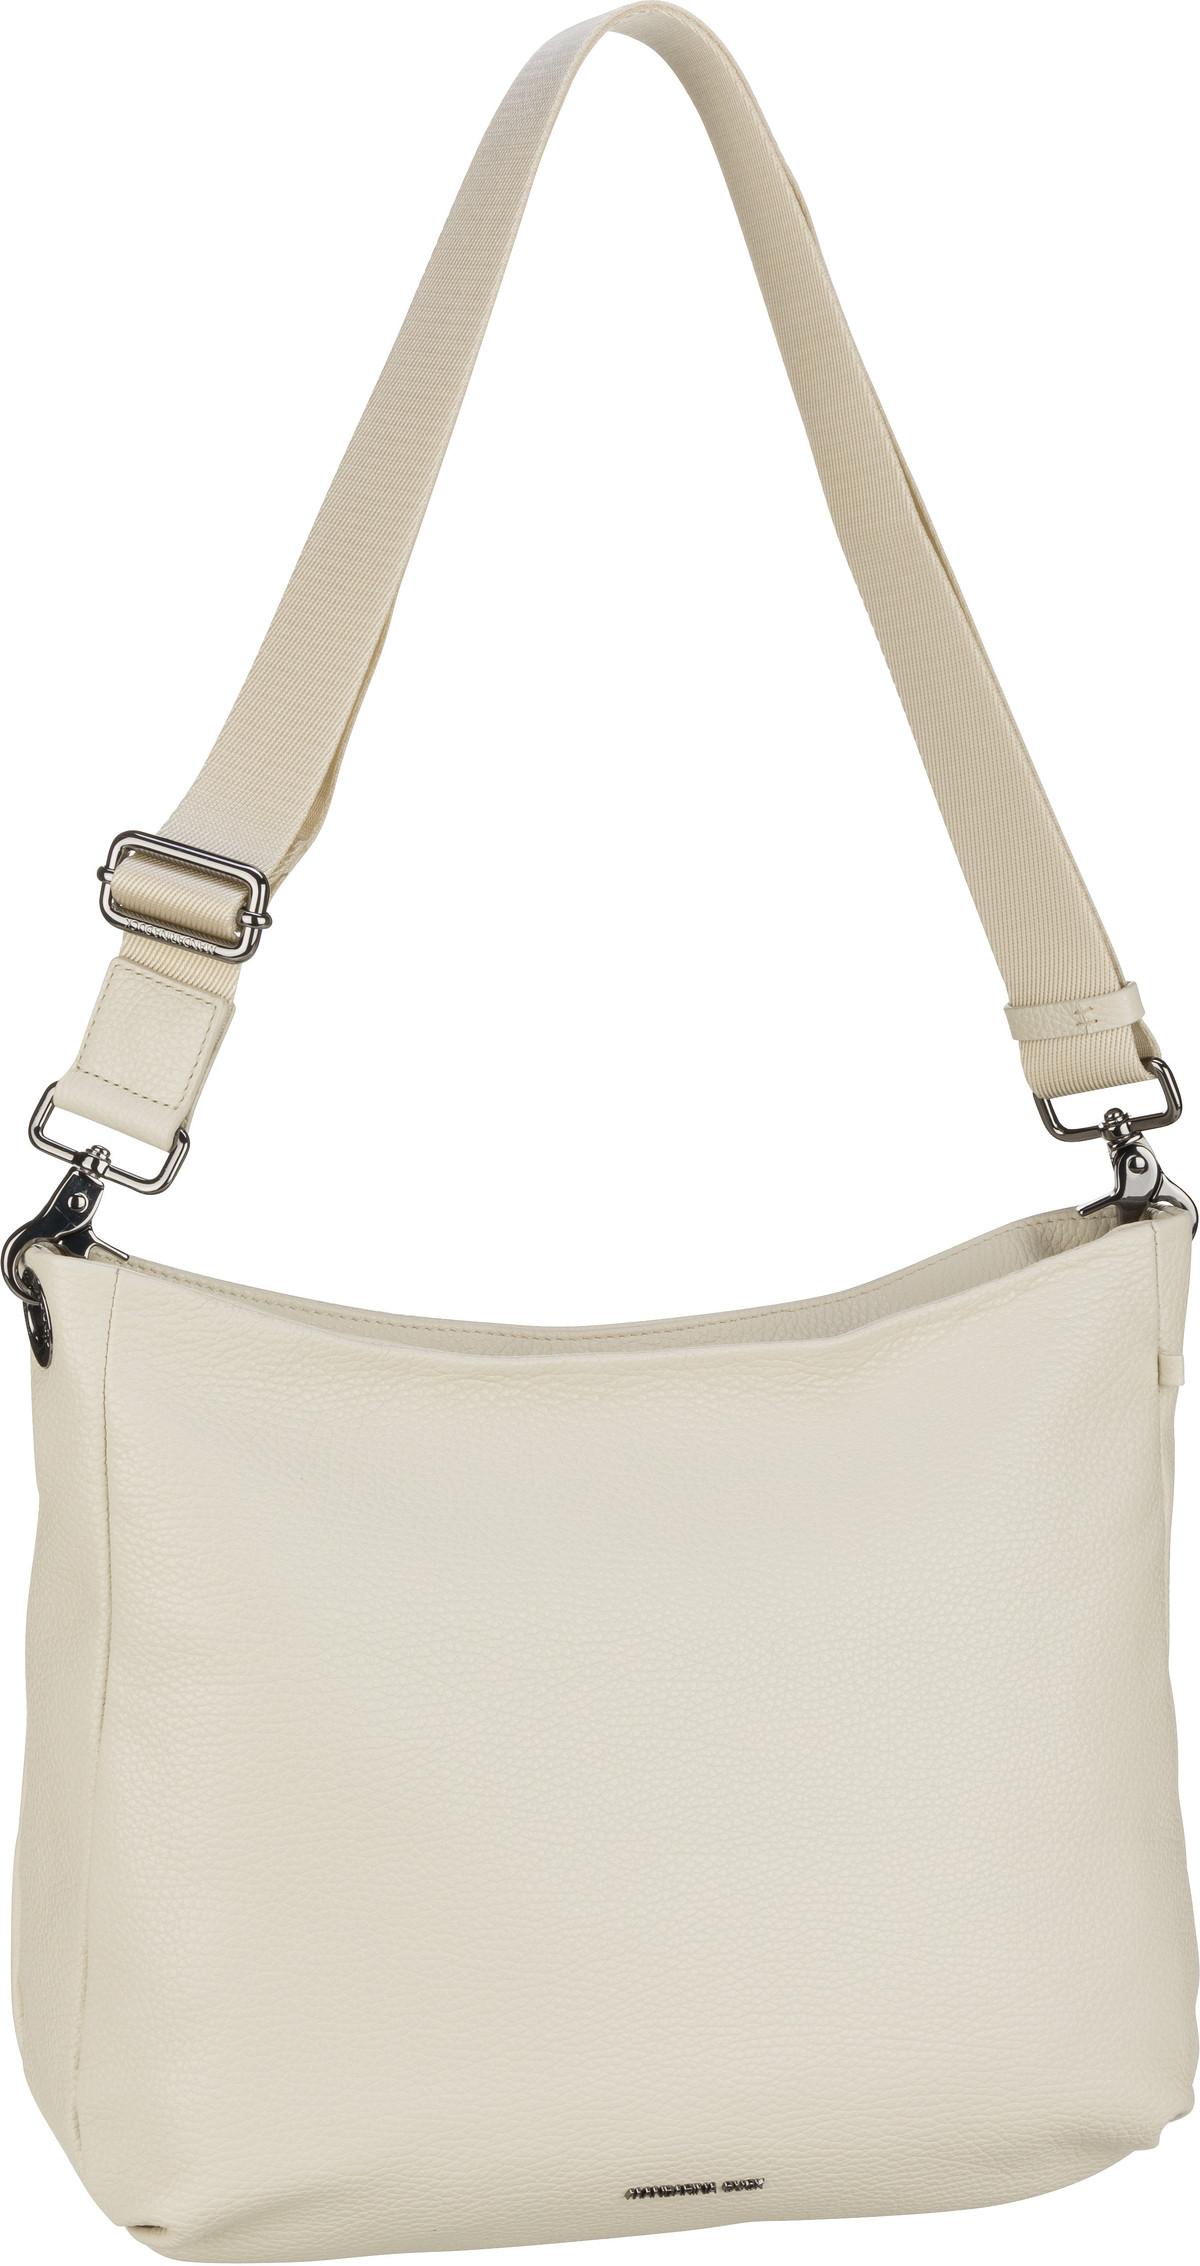 mandarina duck -  Handtasche Mellow Leather Hobo FZT34 Off White